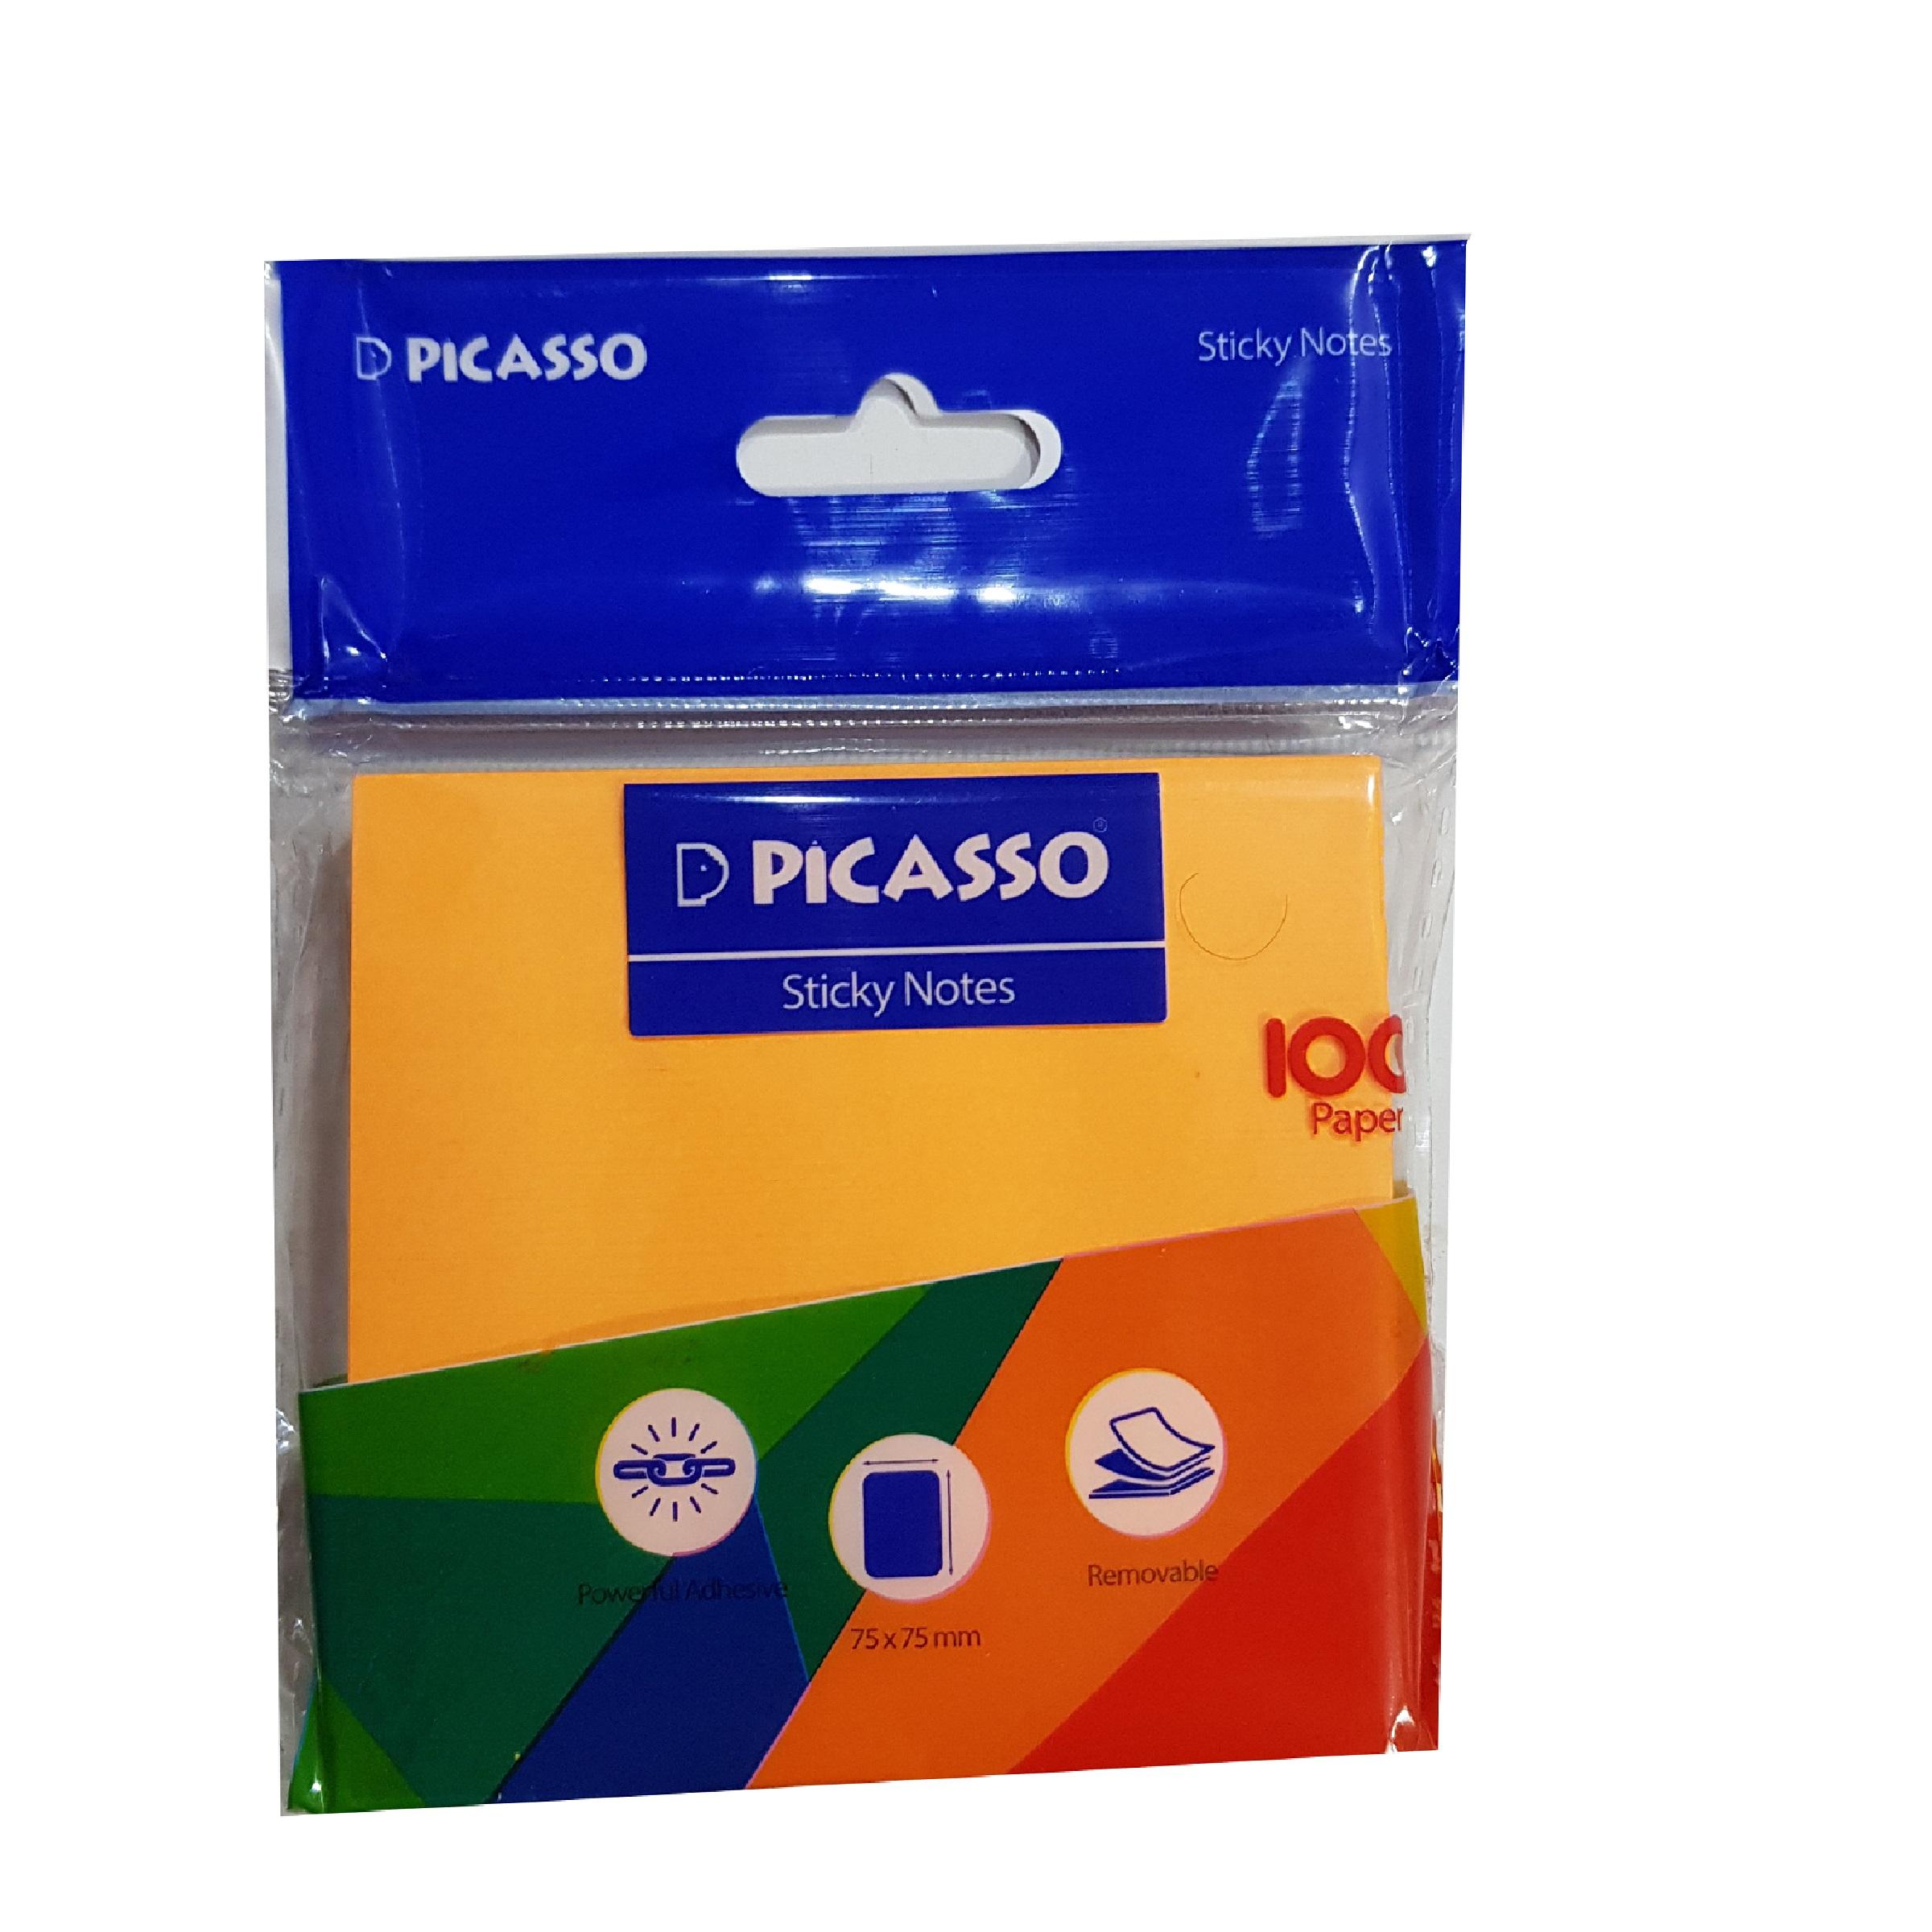 کاغذ یادداشت چسب دار پیکاسو مدل 75 main 1 1